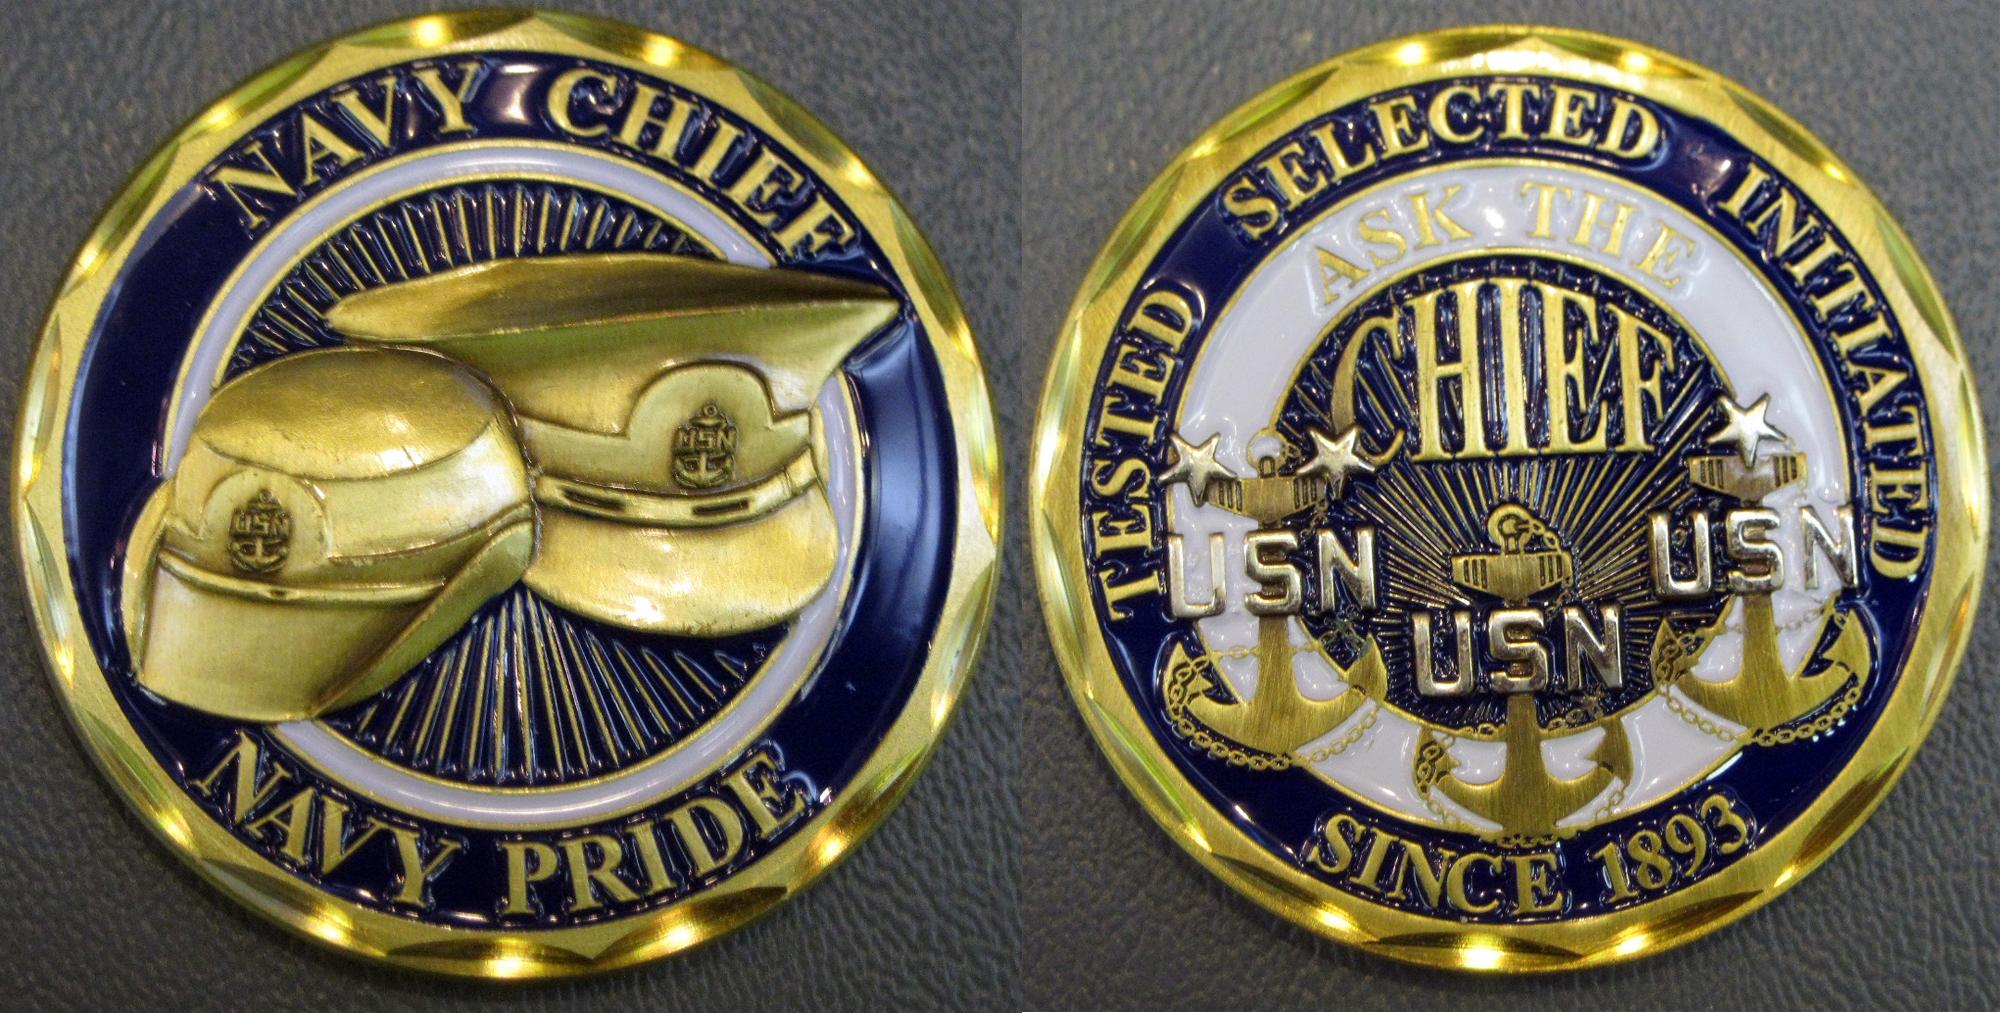 navy chief navy pride coinjpg 2000x1013